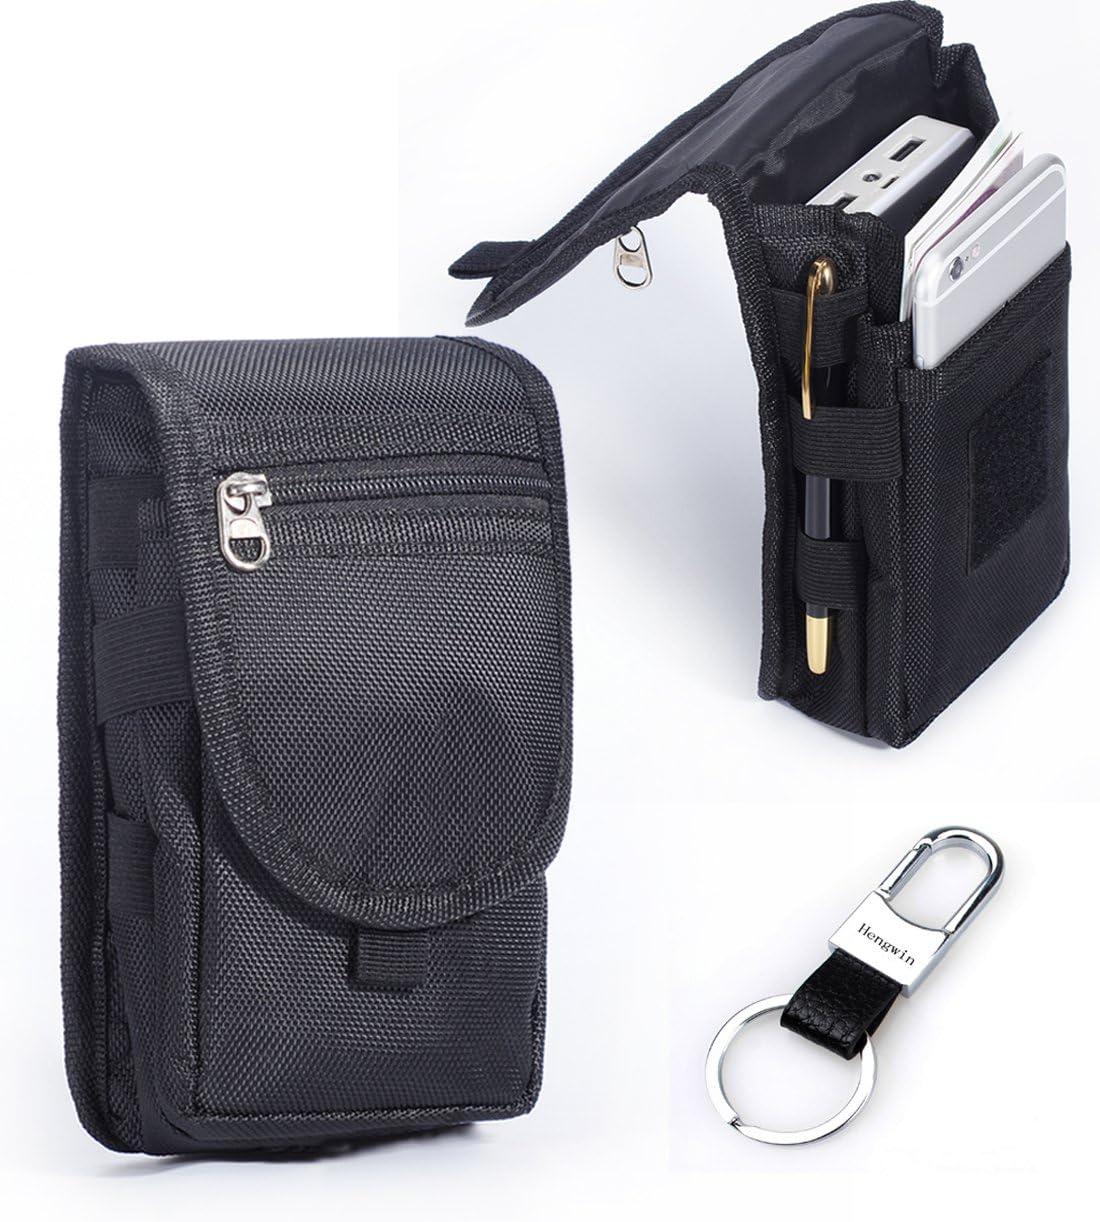 Multipurpose Large Capacity Vertical Nylon Smartphone Holster Belt Loop iPhone 6 Plus Holster Belt Clip Waist Bag Money Pocket Carry Pouch for LG G3/G4 Galaxy Note 5 S6 Edge Keyring-Black